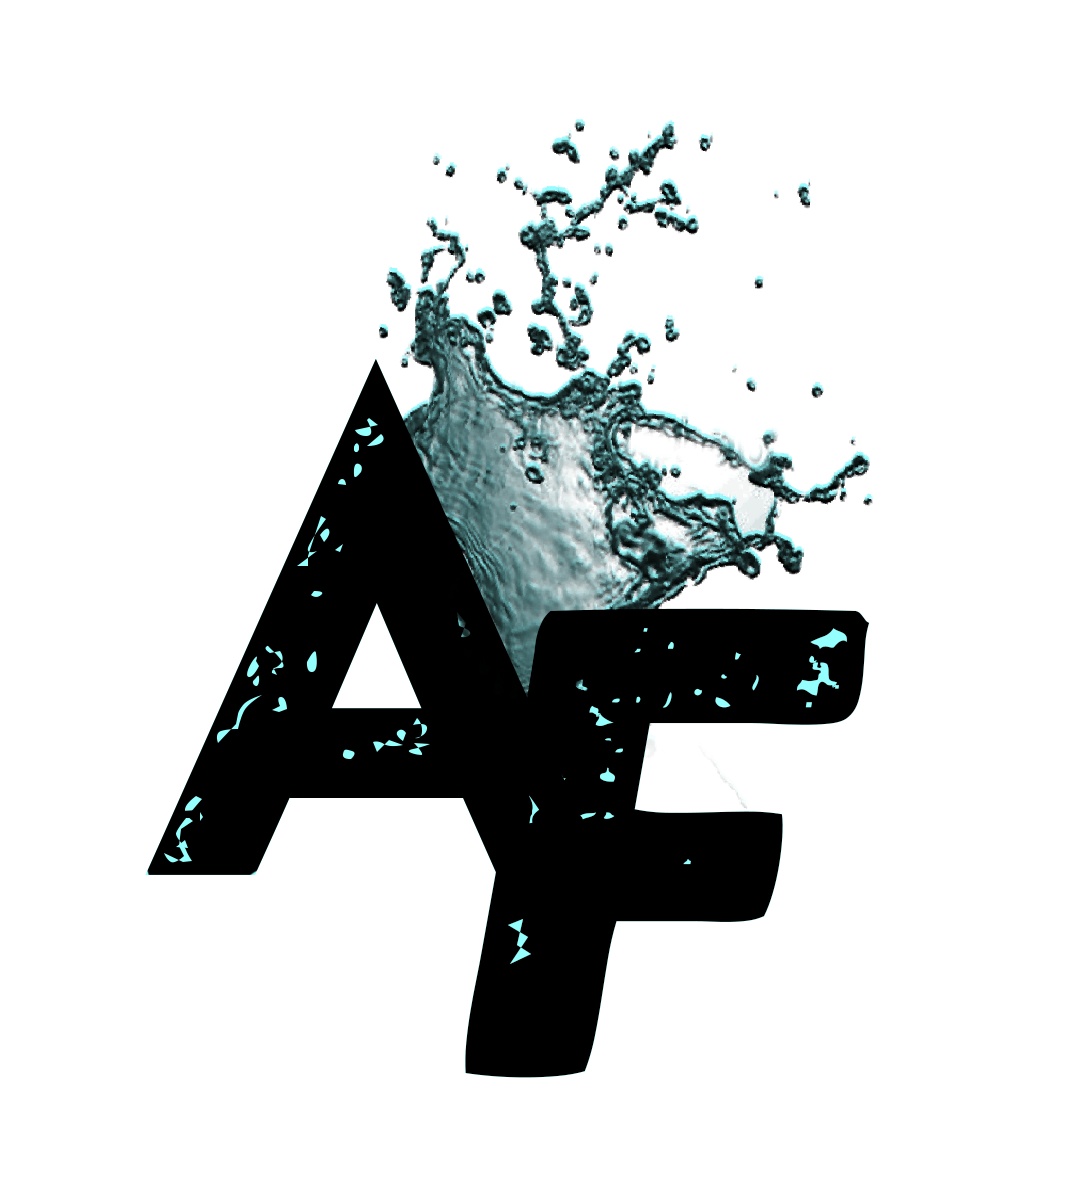 Aquafit_logo1.png